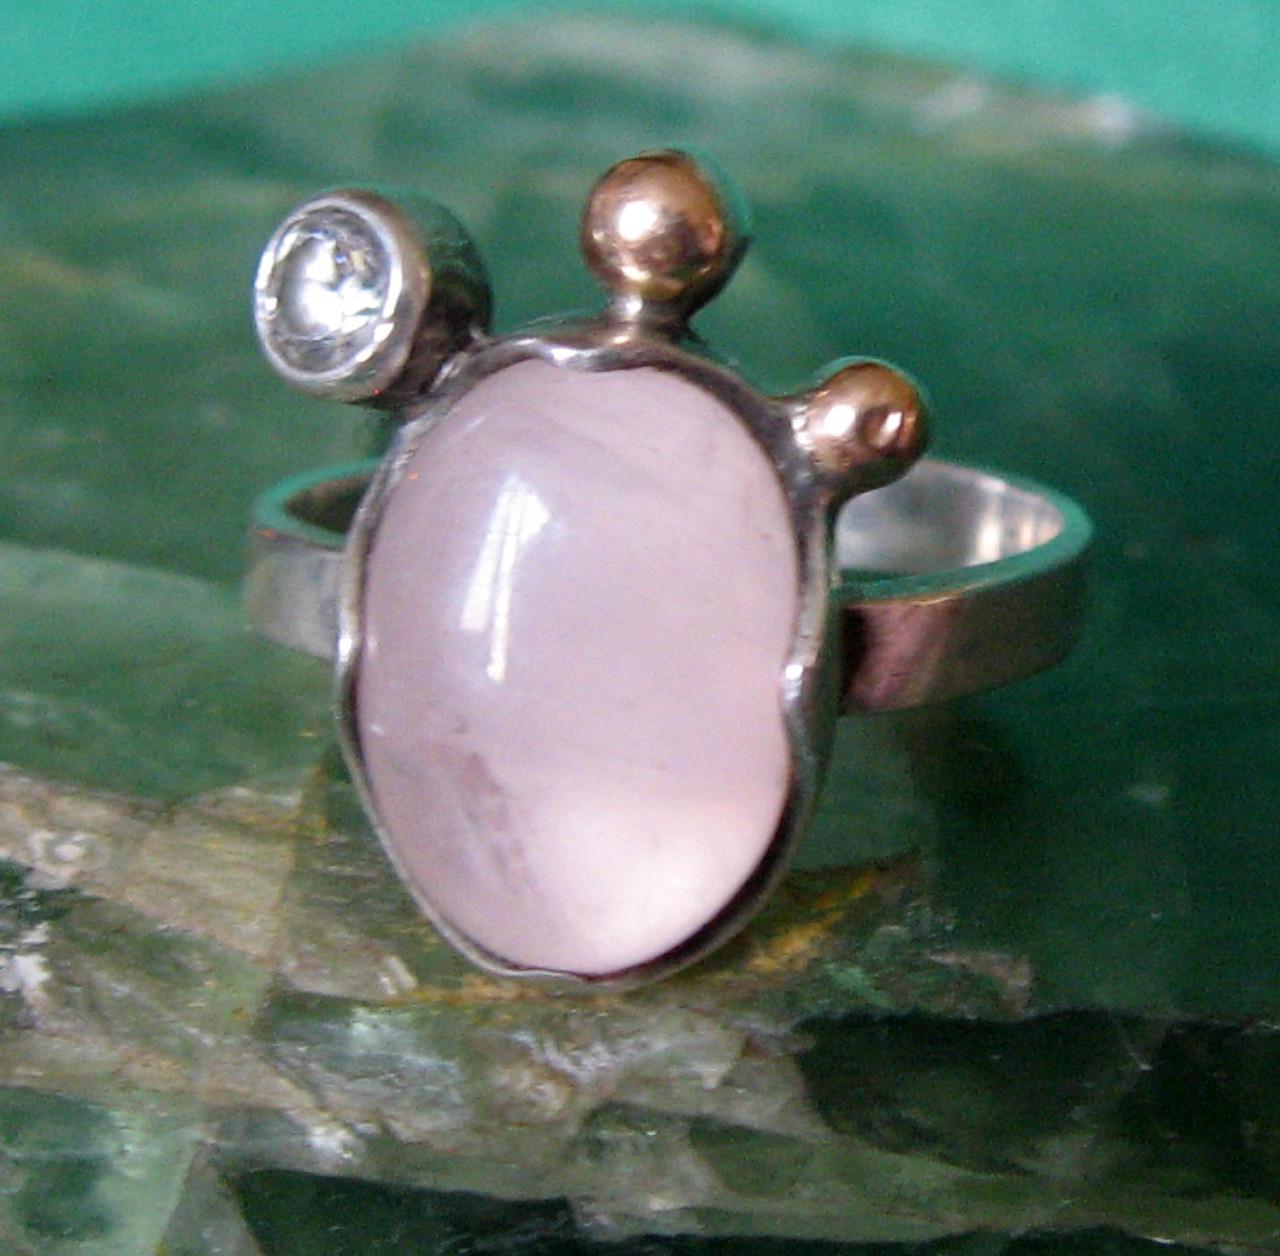 Кольцо.Серебро 925пр.Розовый кварц.Украина